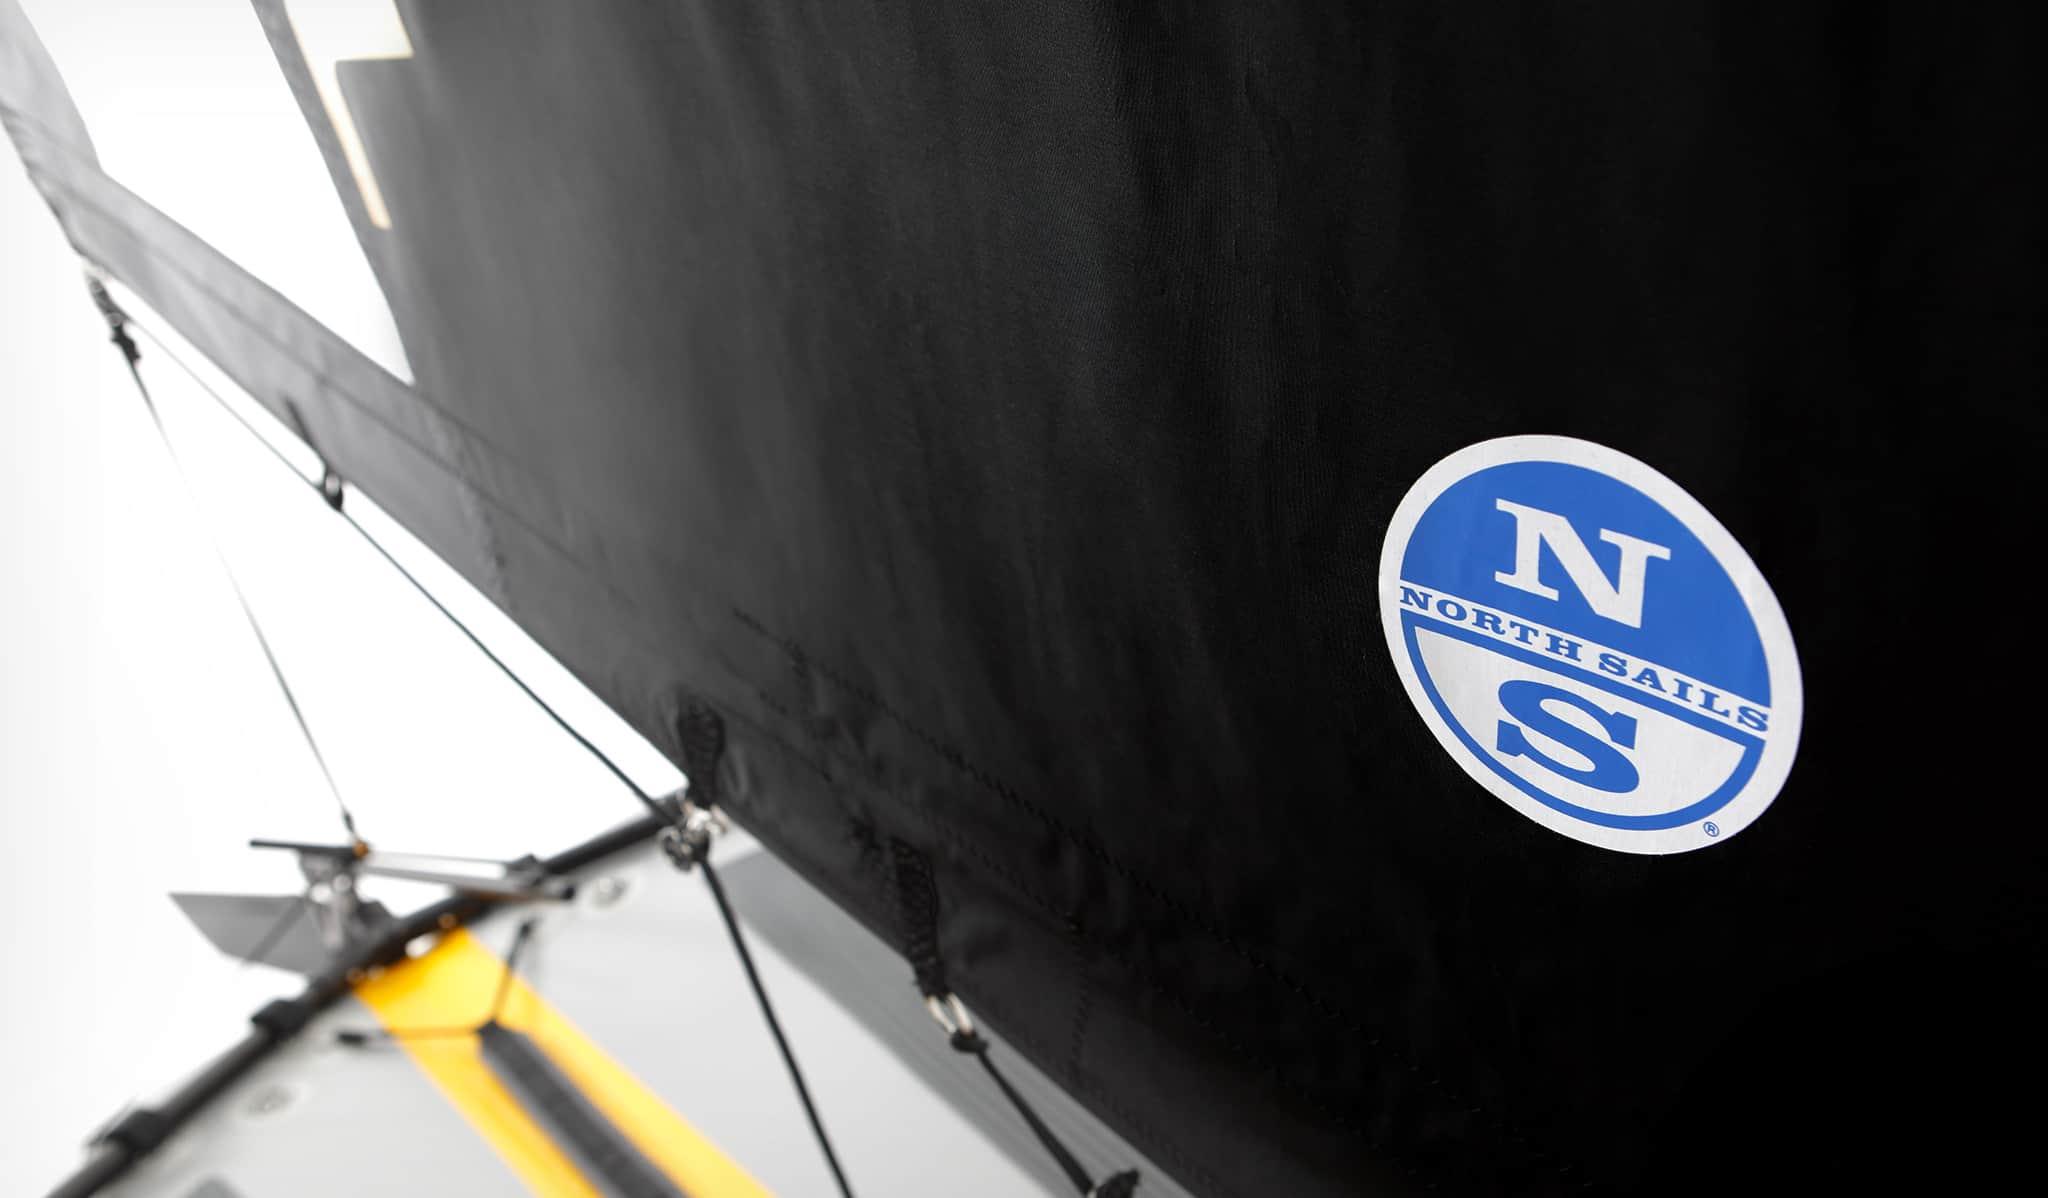 Tiwal 3 Dacron & monofilm sails made by North Sails